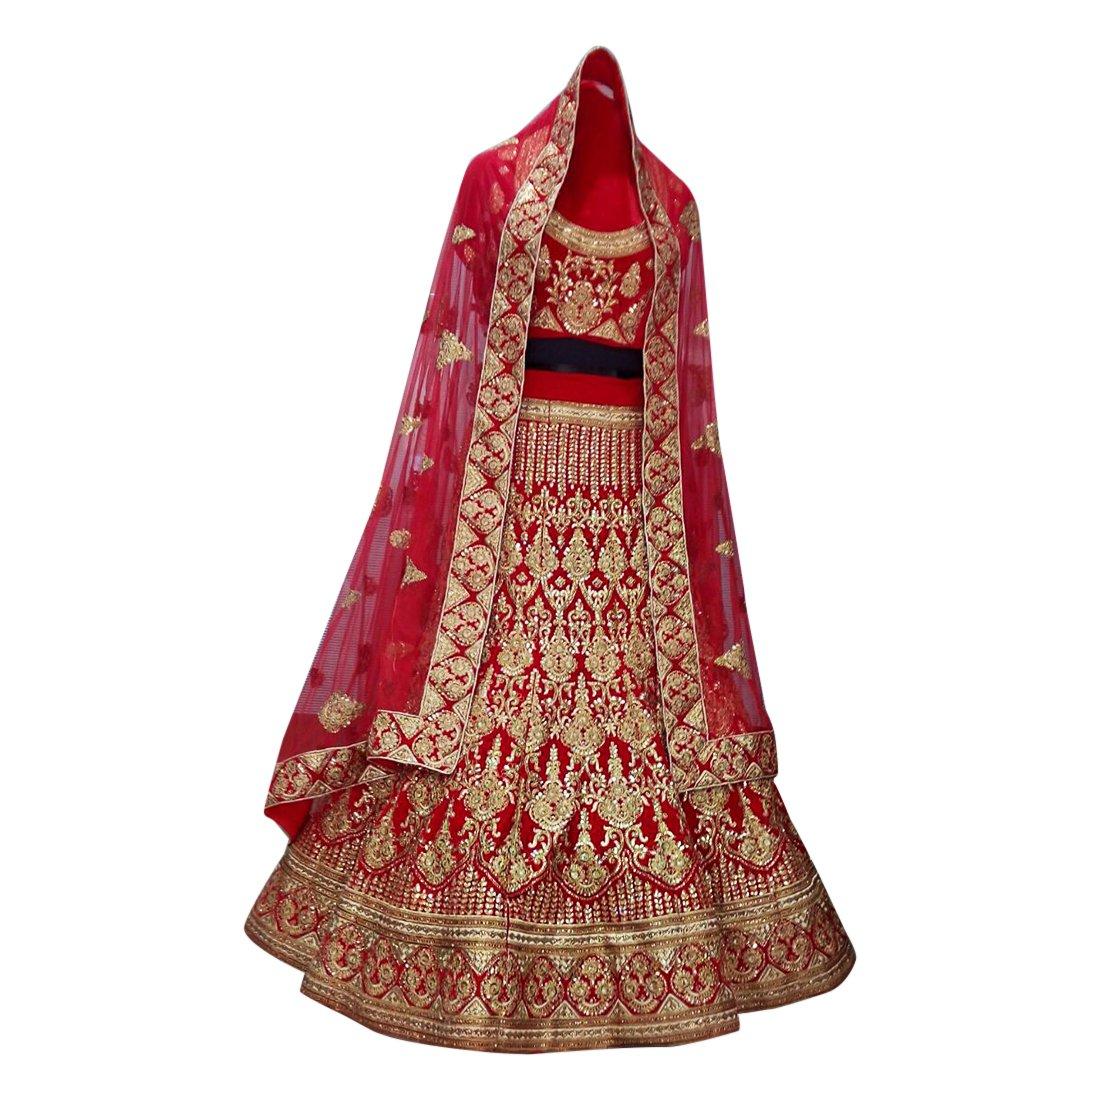 New Designer Collection Ethnic Heavy Indian Bridal Wedding Women Lehenga Choli Anarkali Salwar Chaniya Choli By Balaji Emporium 608 25